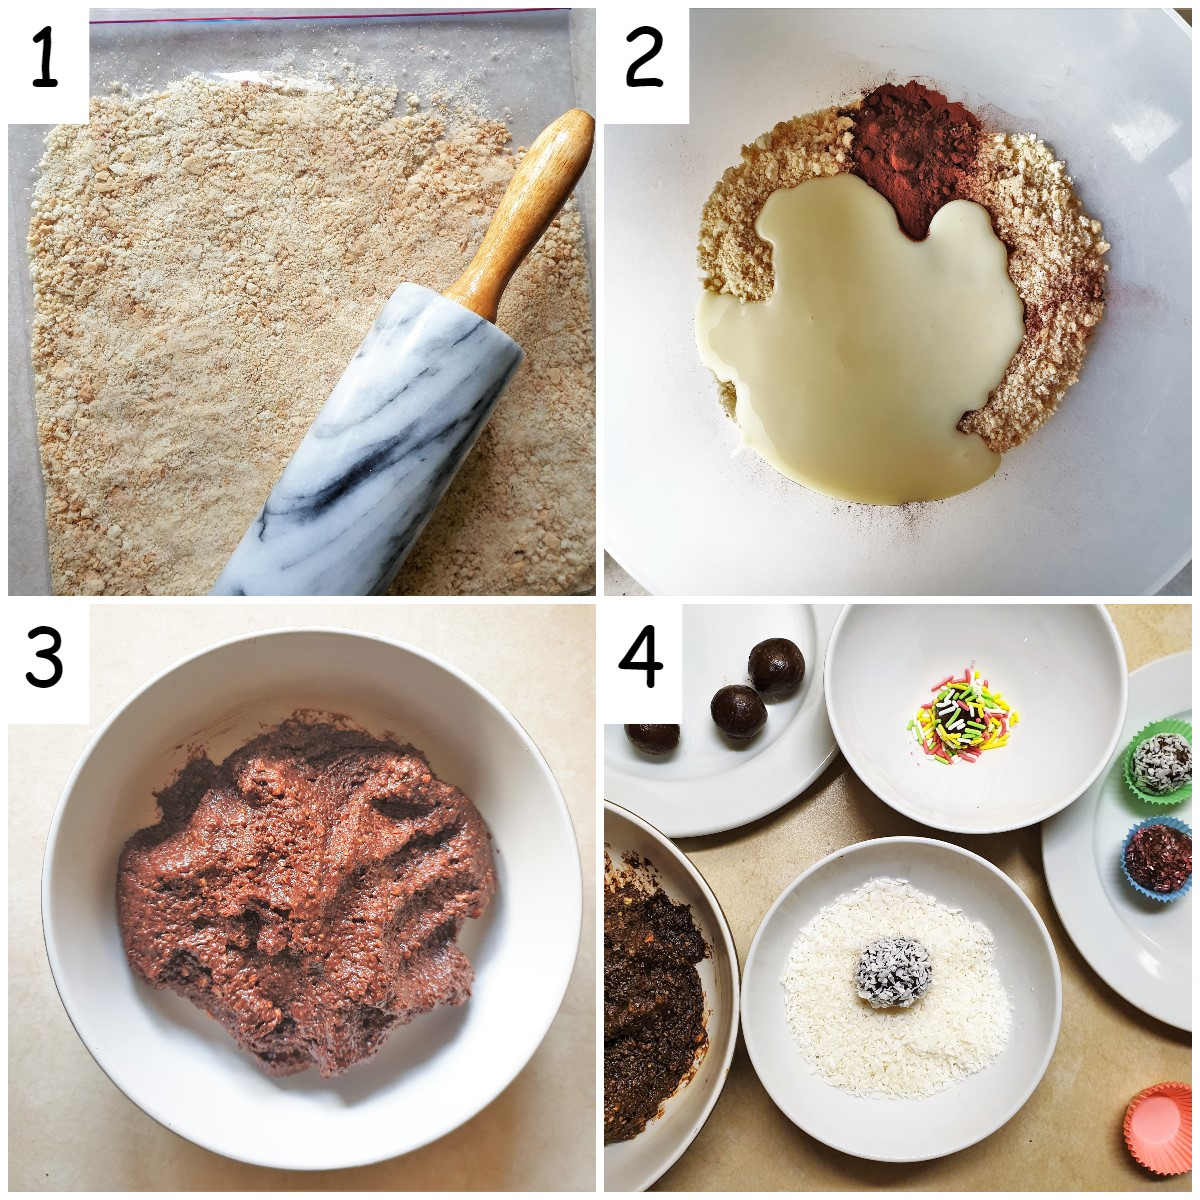 Steps for making Baileys chocolate truffles.